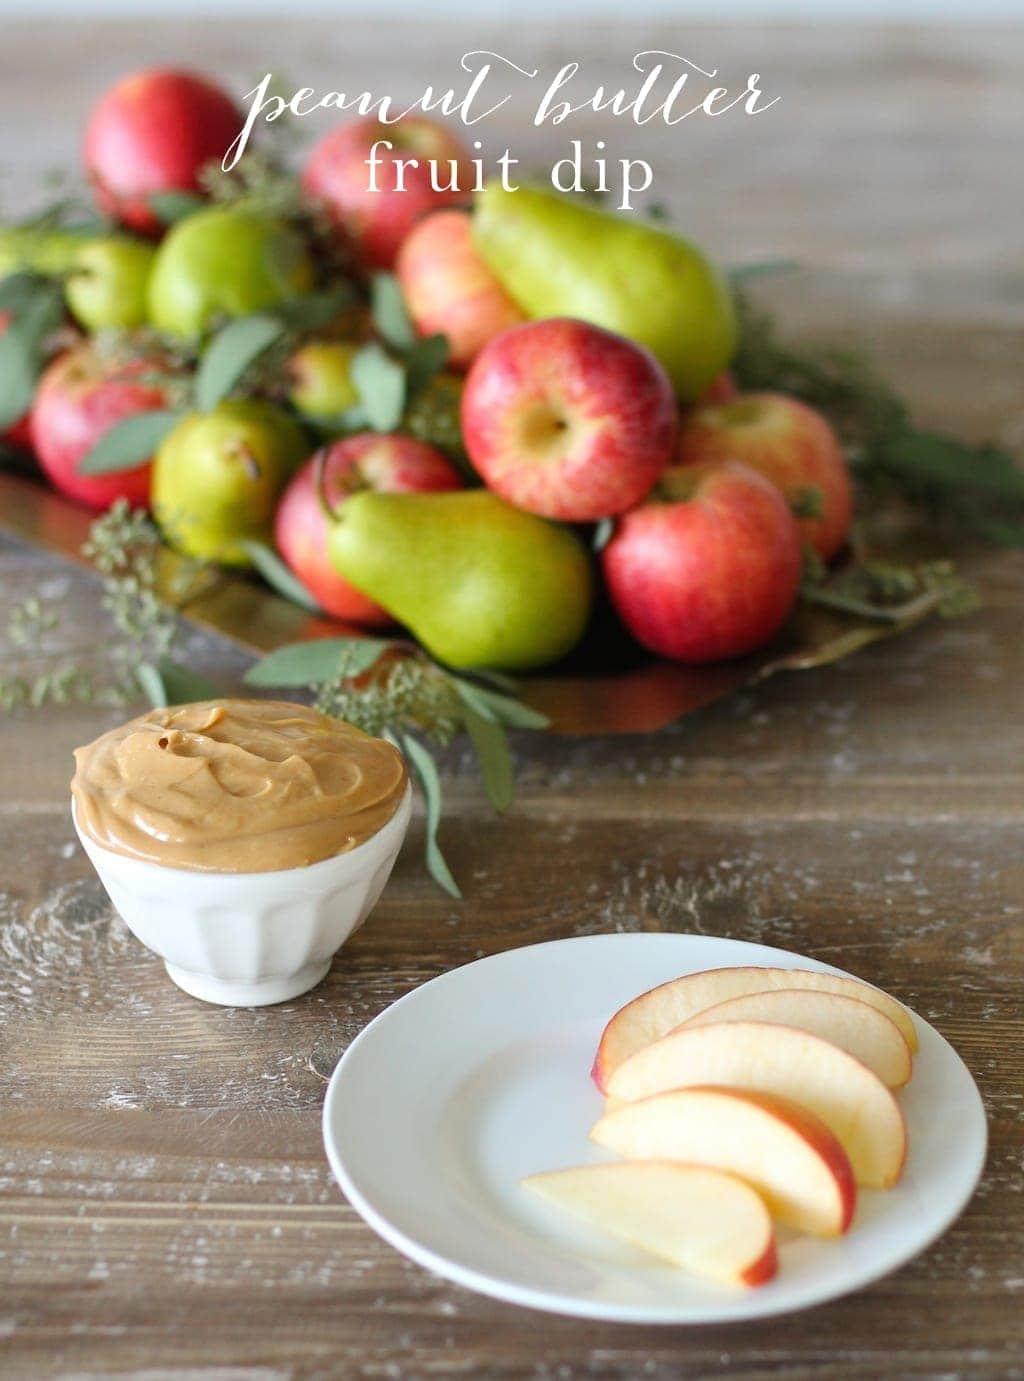 healthy breakfast with fruit fruit dip recipe